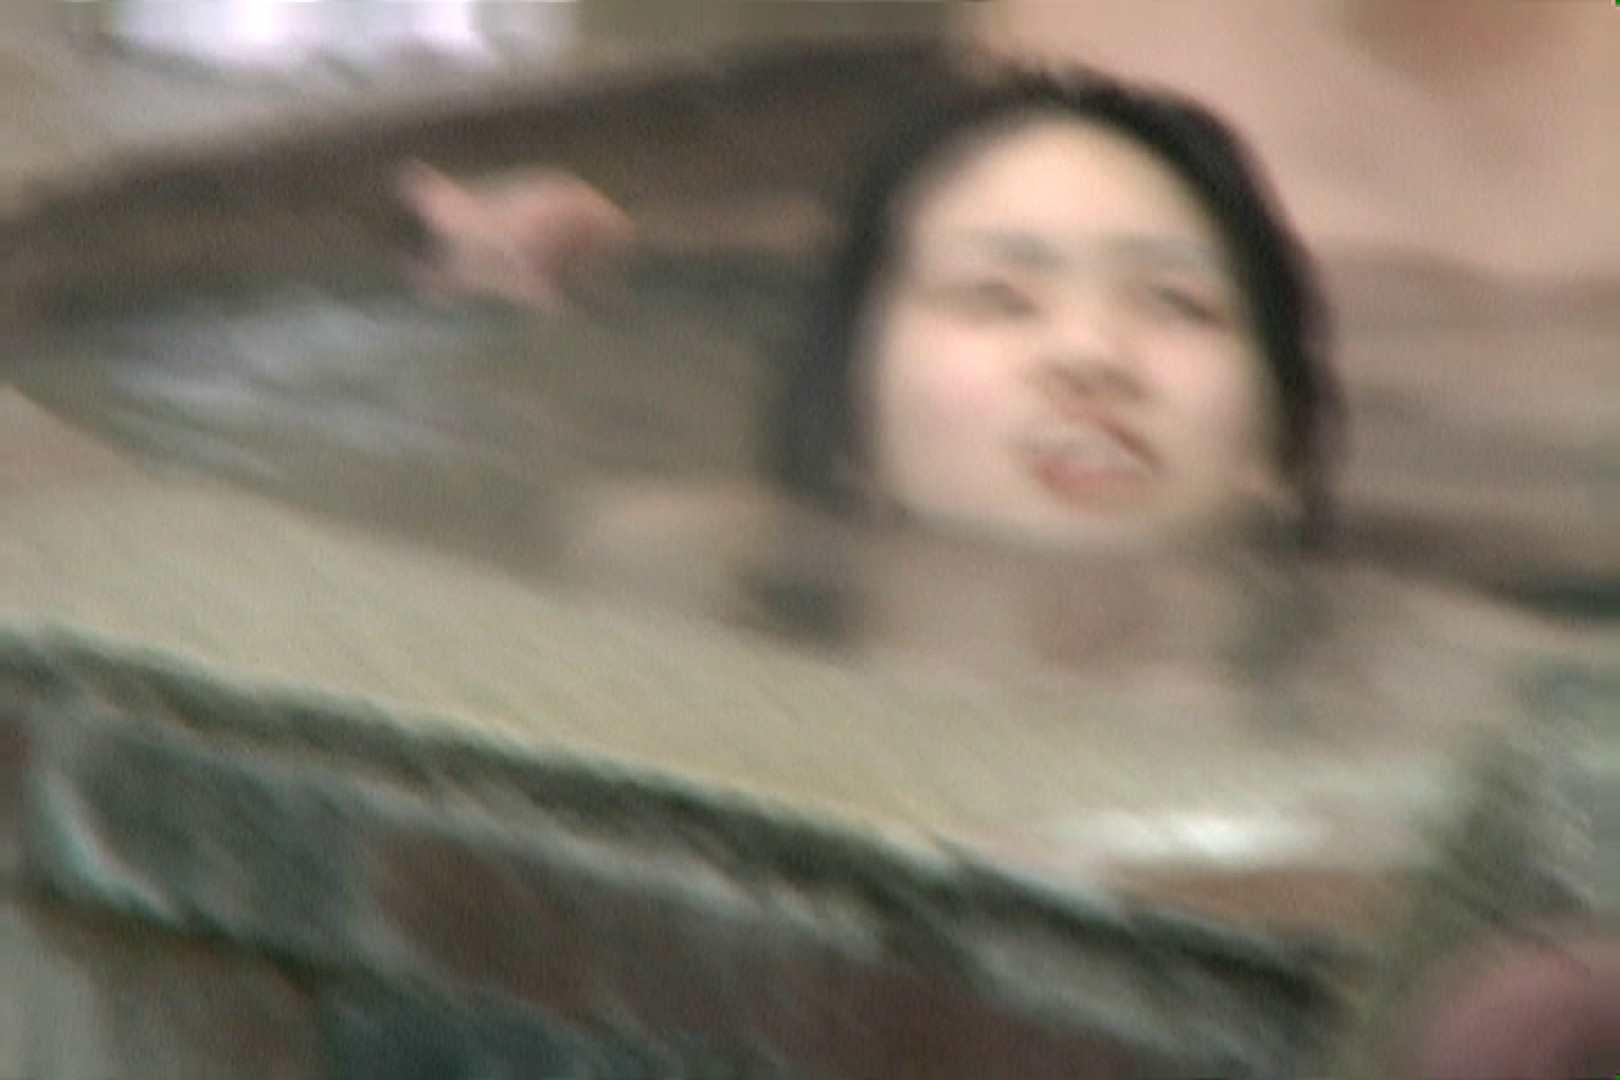 Aquaな露天風呂Vol.646 HなOL | 盗撮  89pic 60